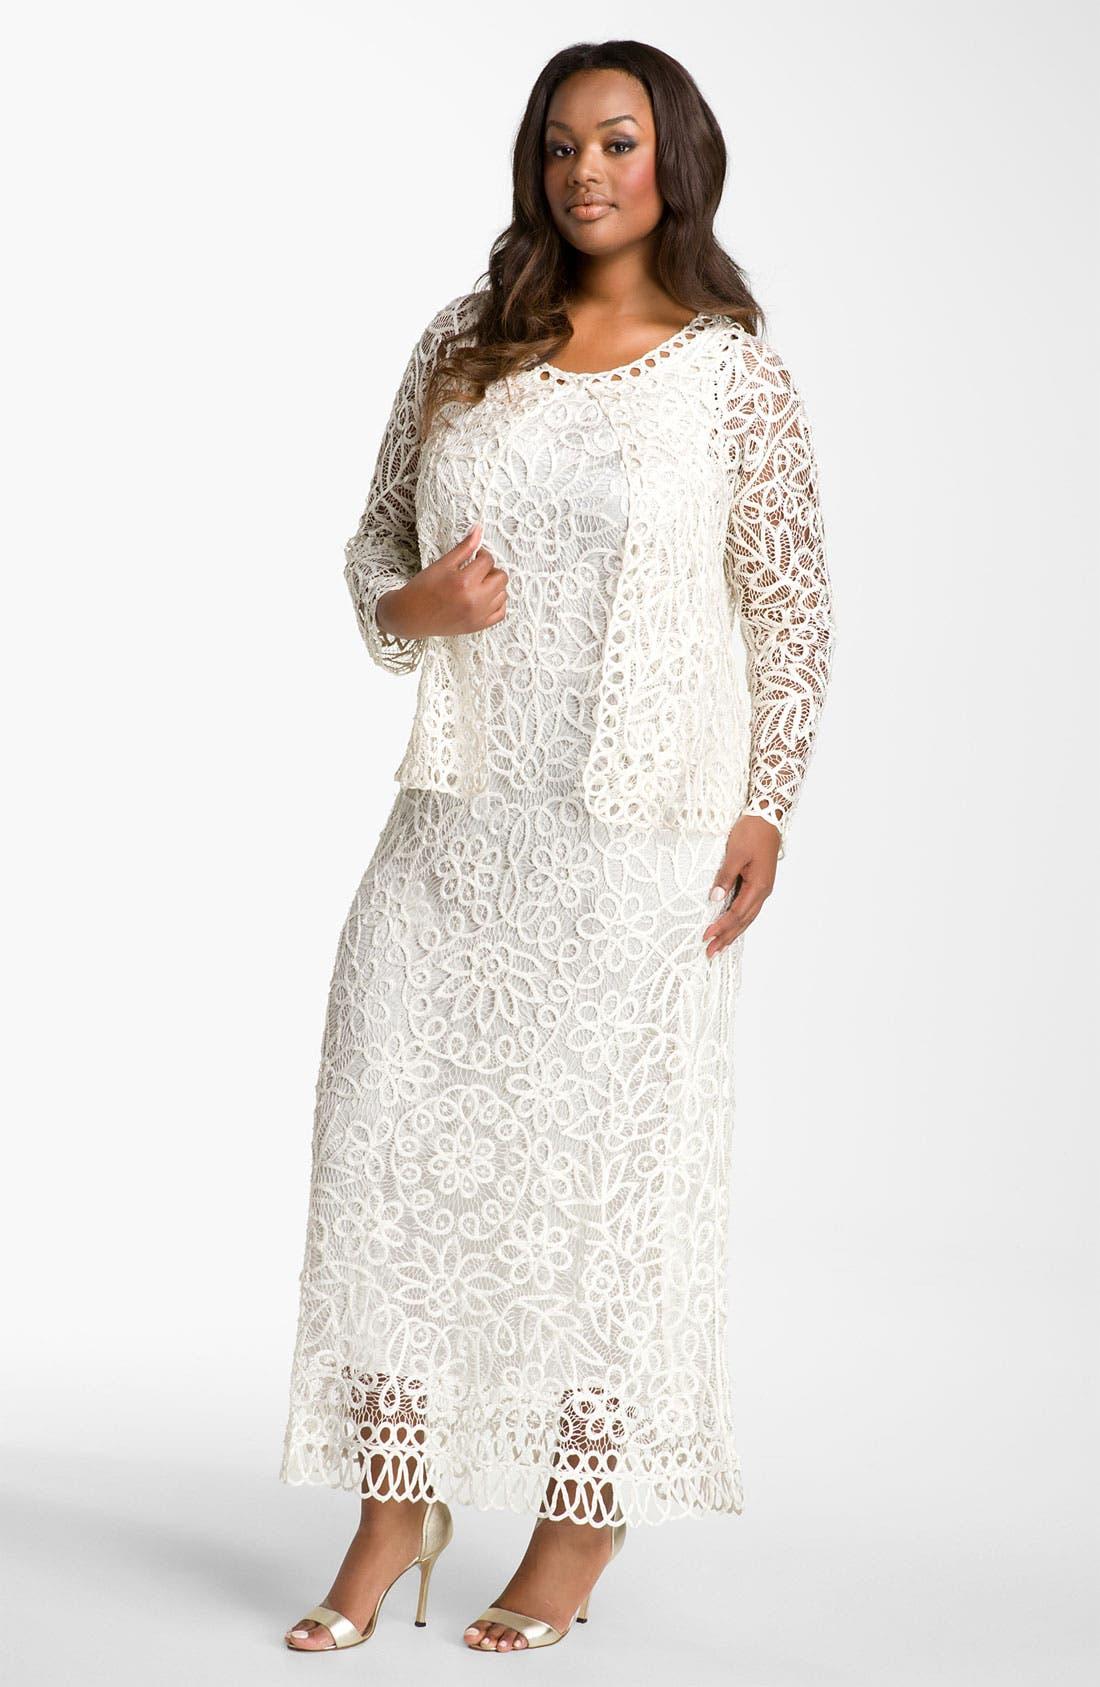 Main Image - Soulmates Crochet Dress with Jacket (Plus Size)